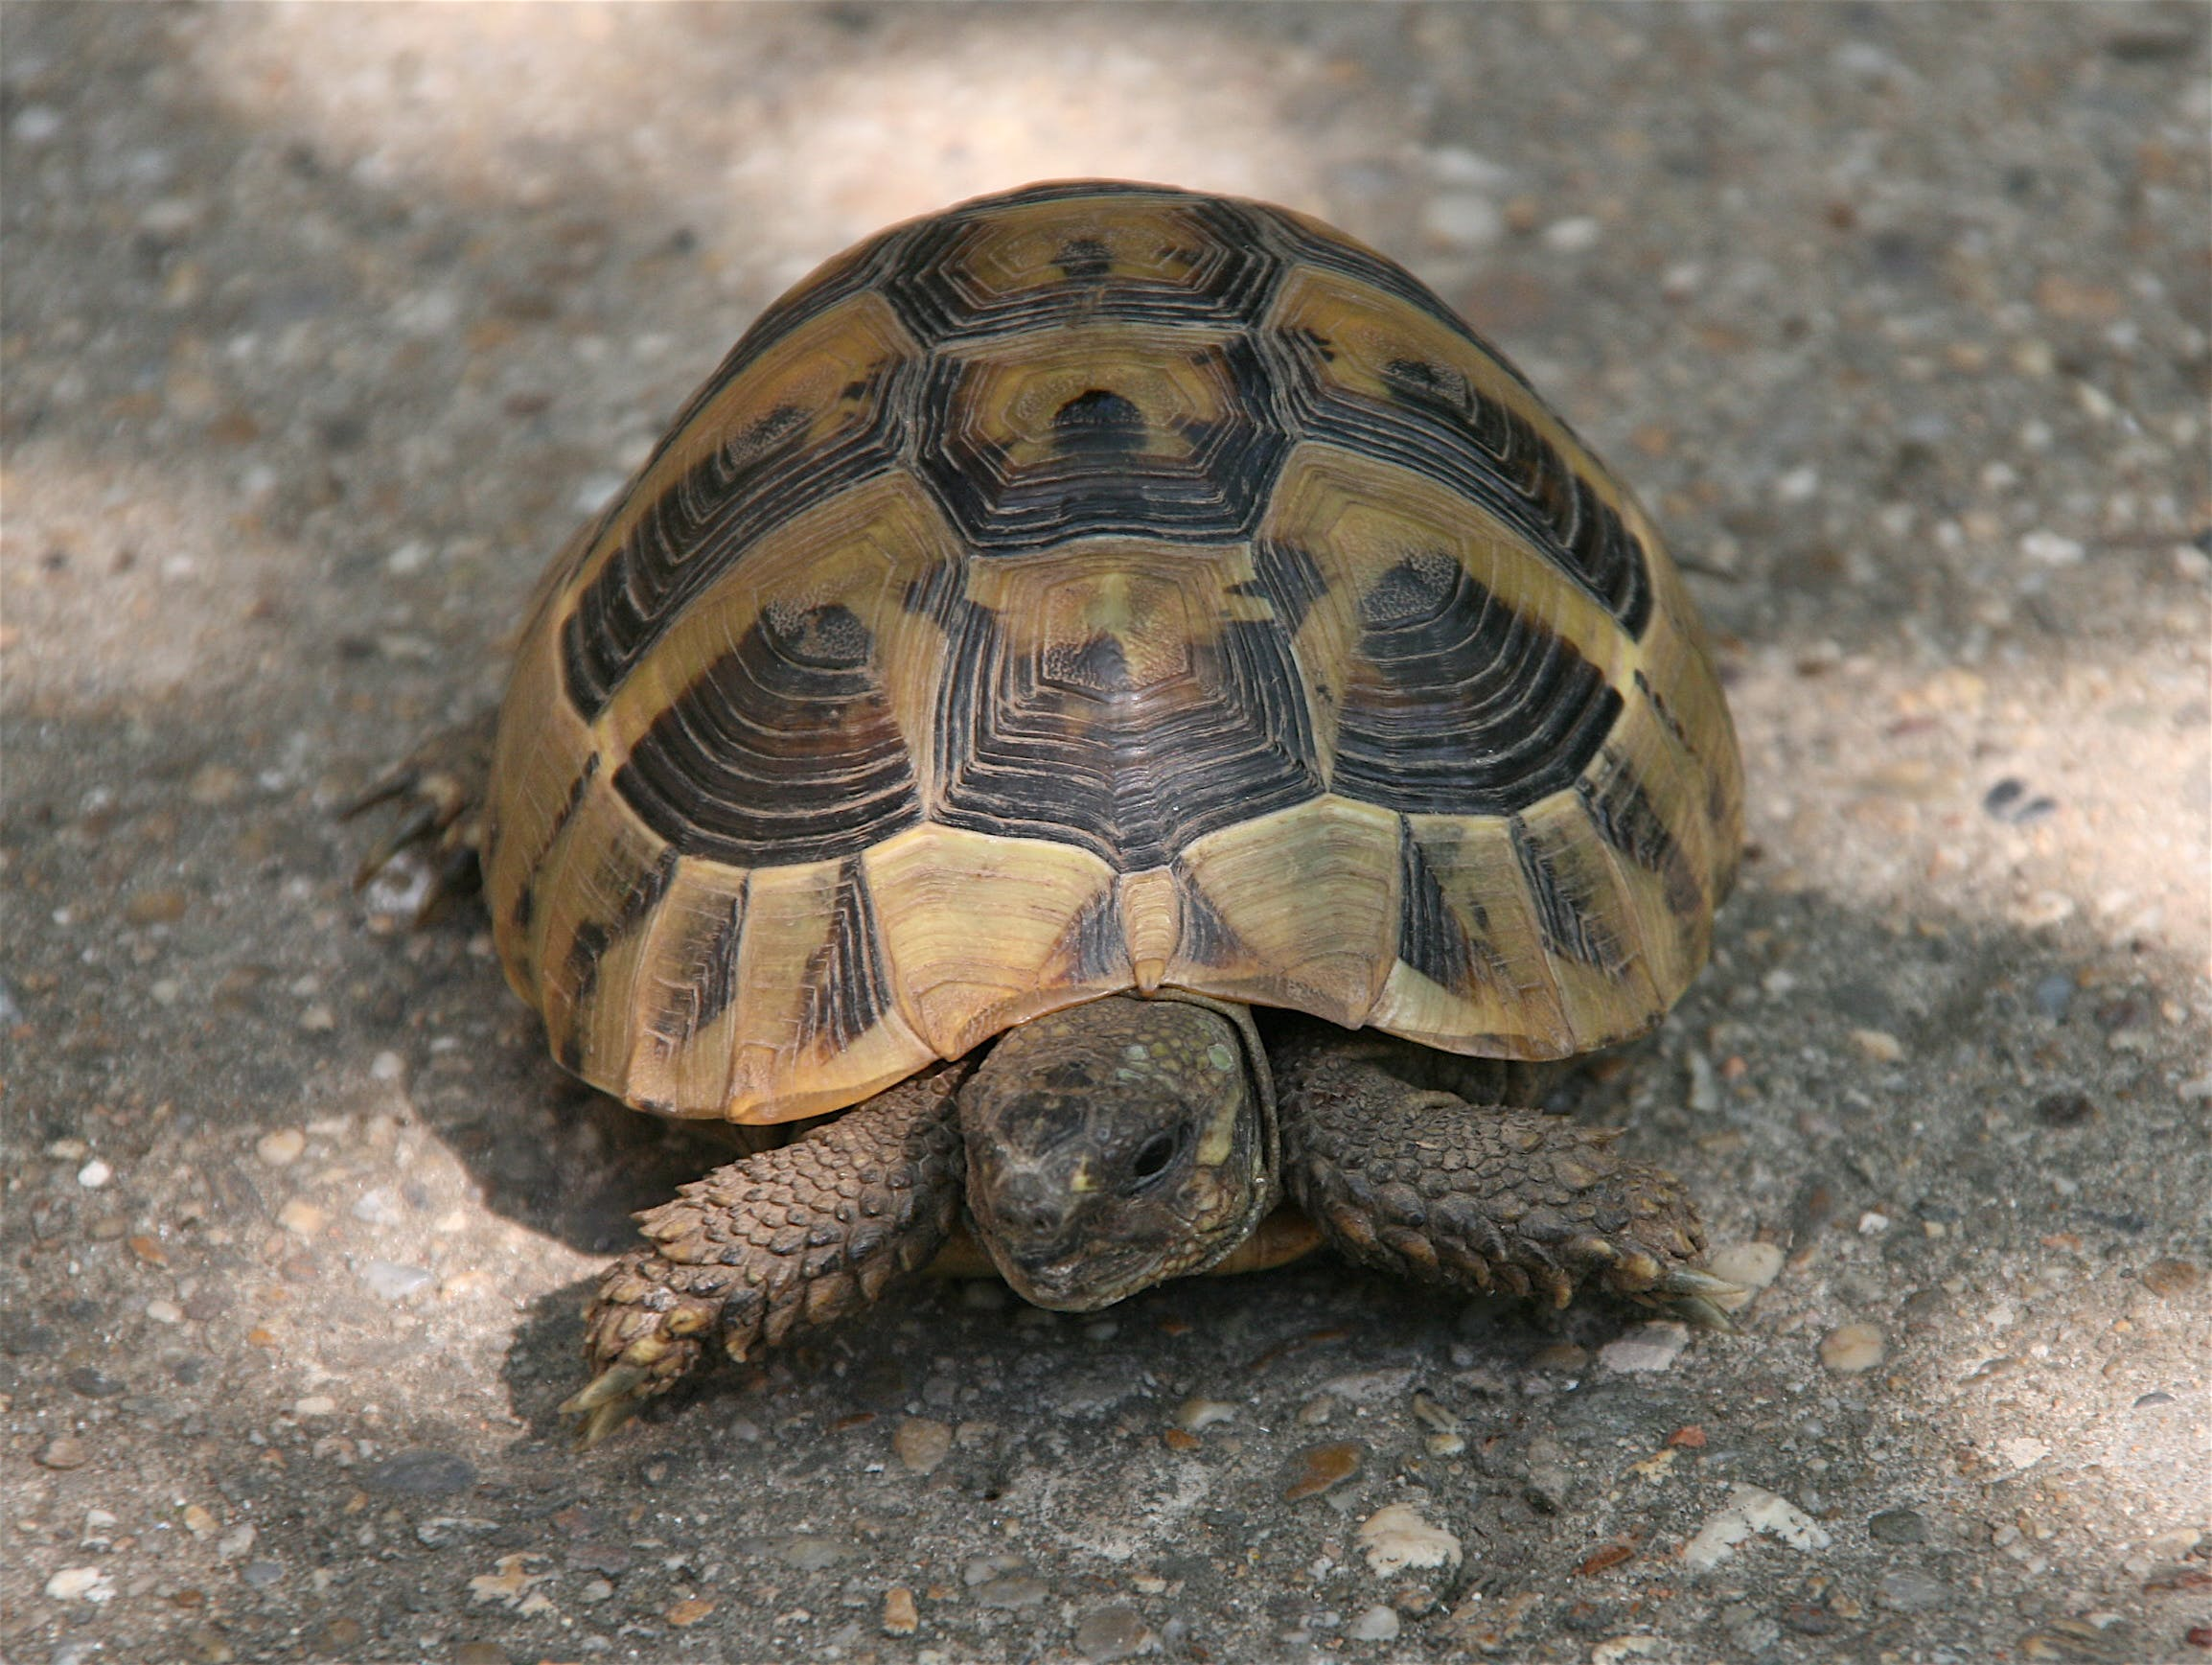 Free stock photo of tortoise